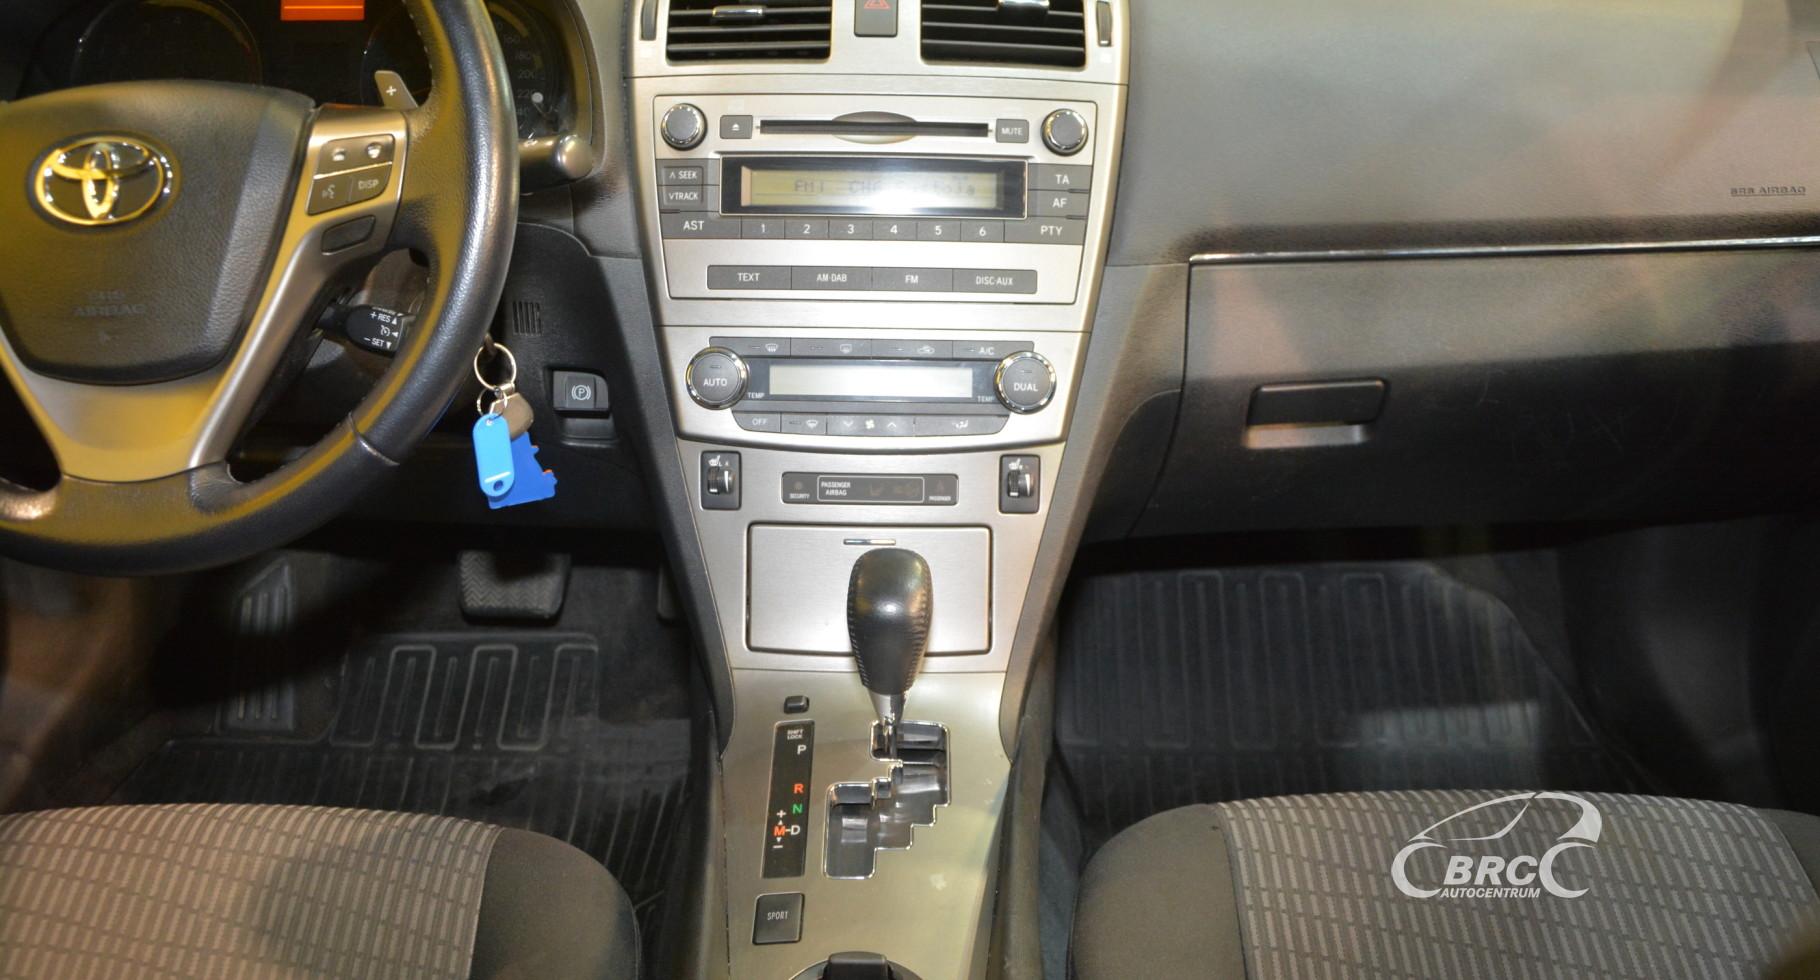 Toyota Avensis 2.0 VVT-i Automatas